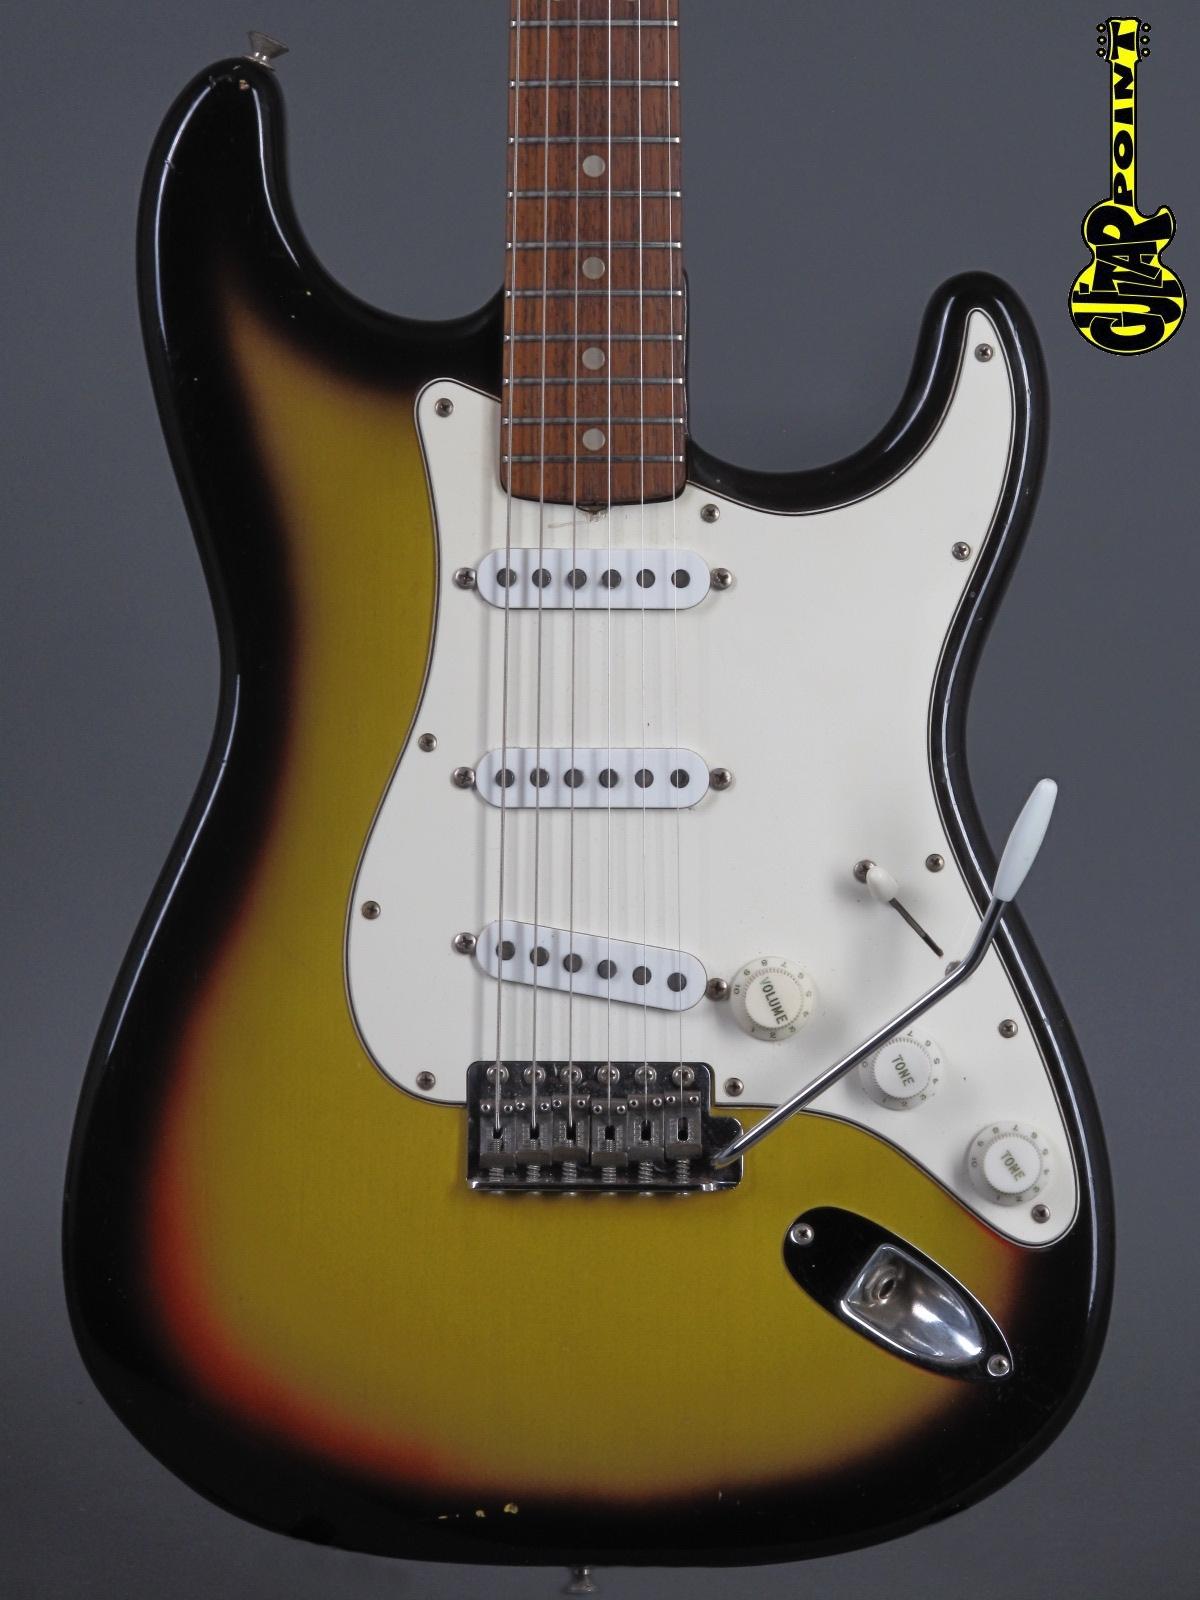 1966 Fender Stratocaster - 3t-Sunburst incl. orig. Tolex case